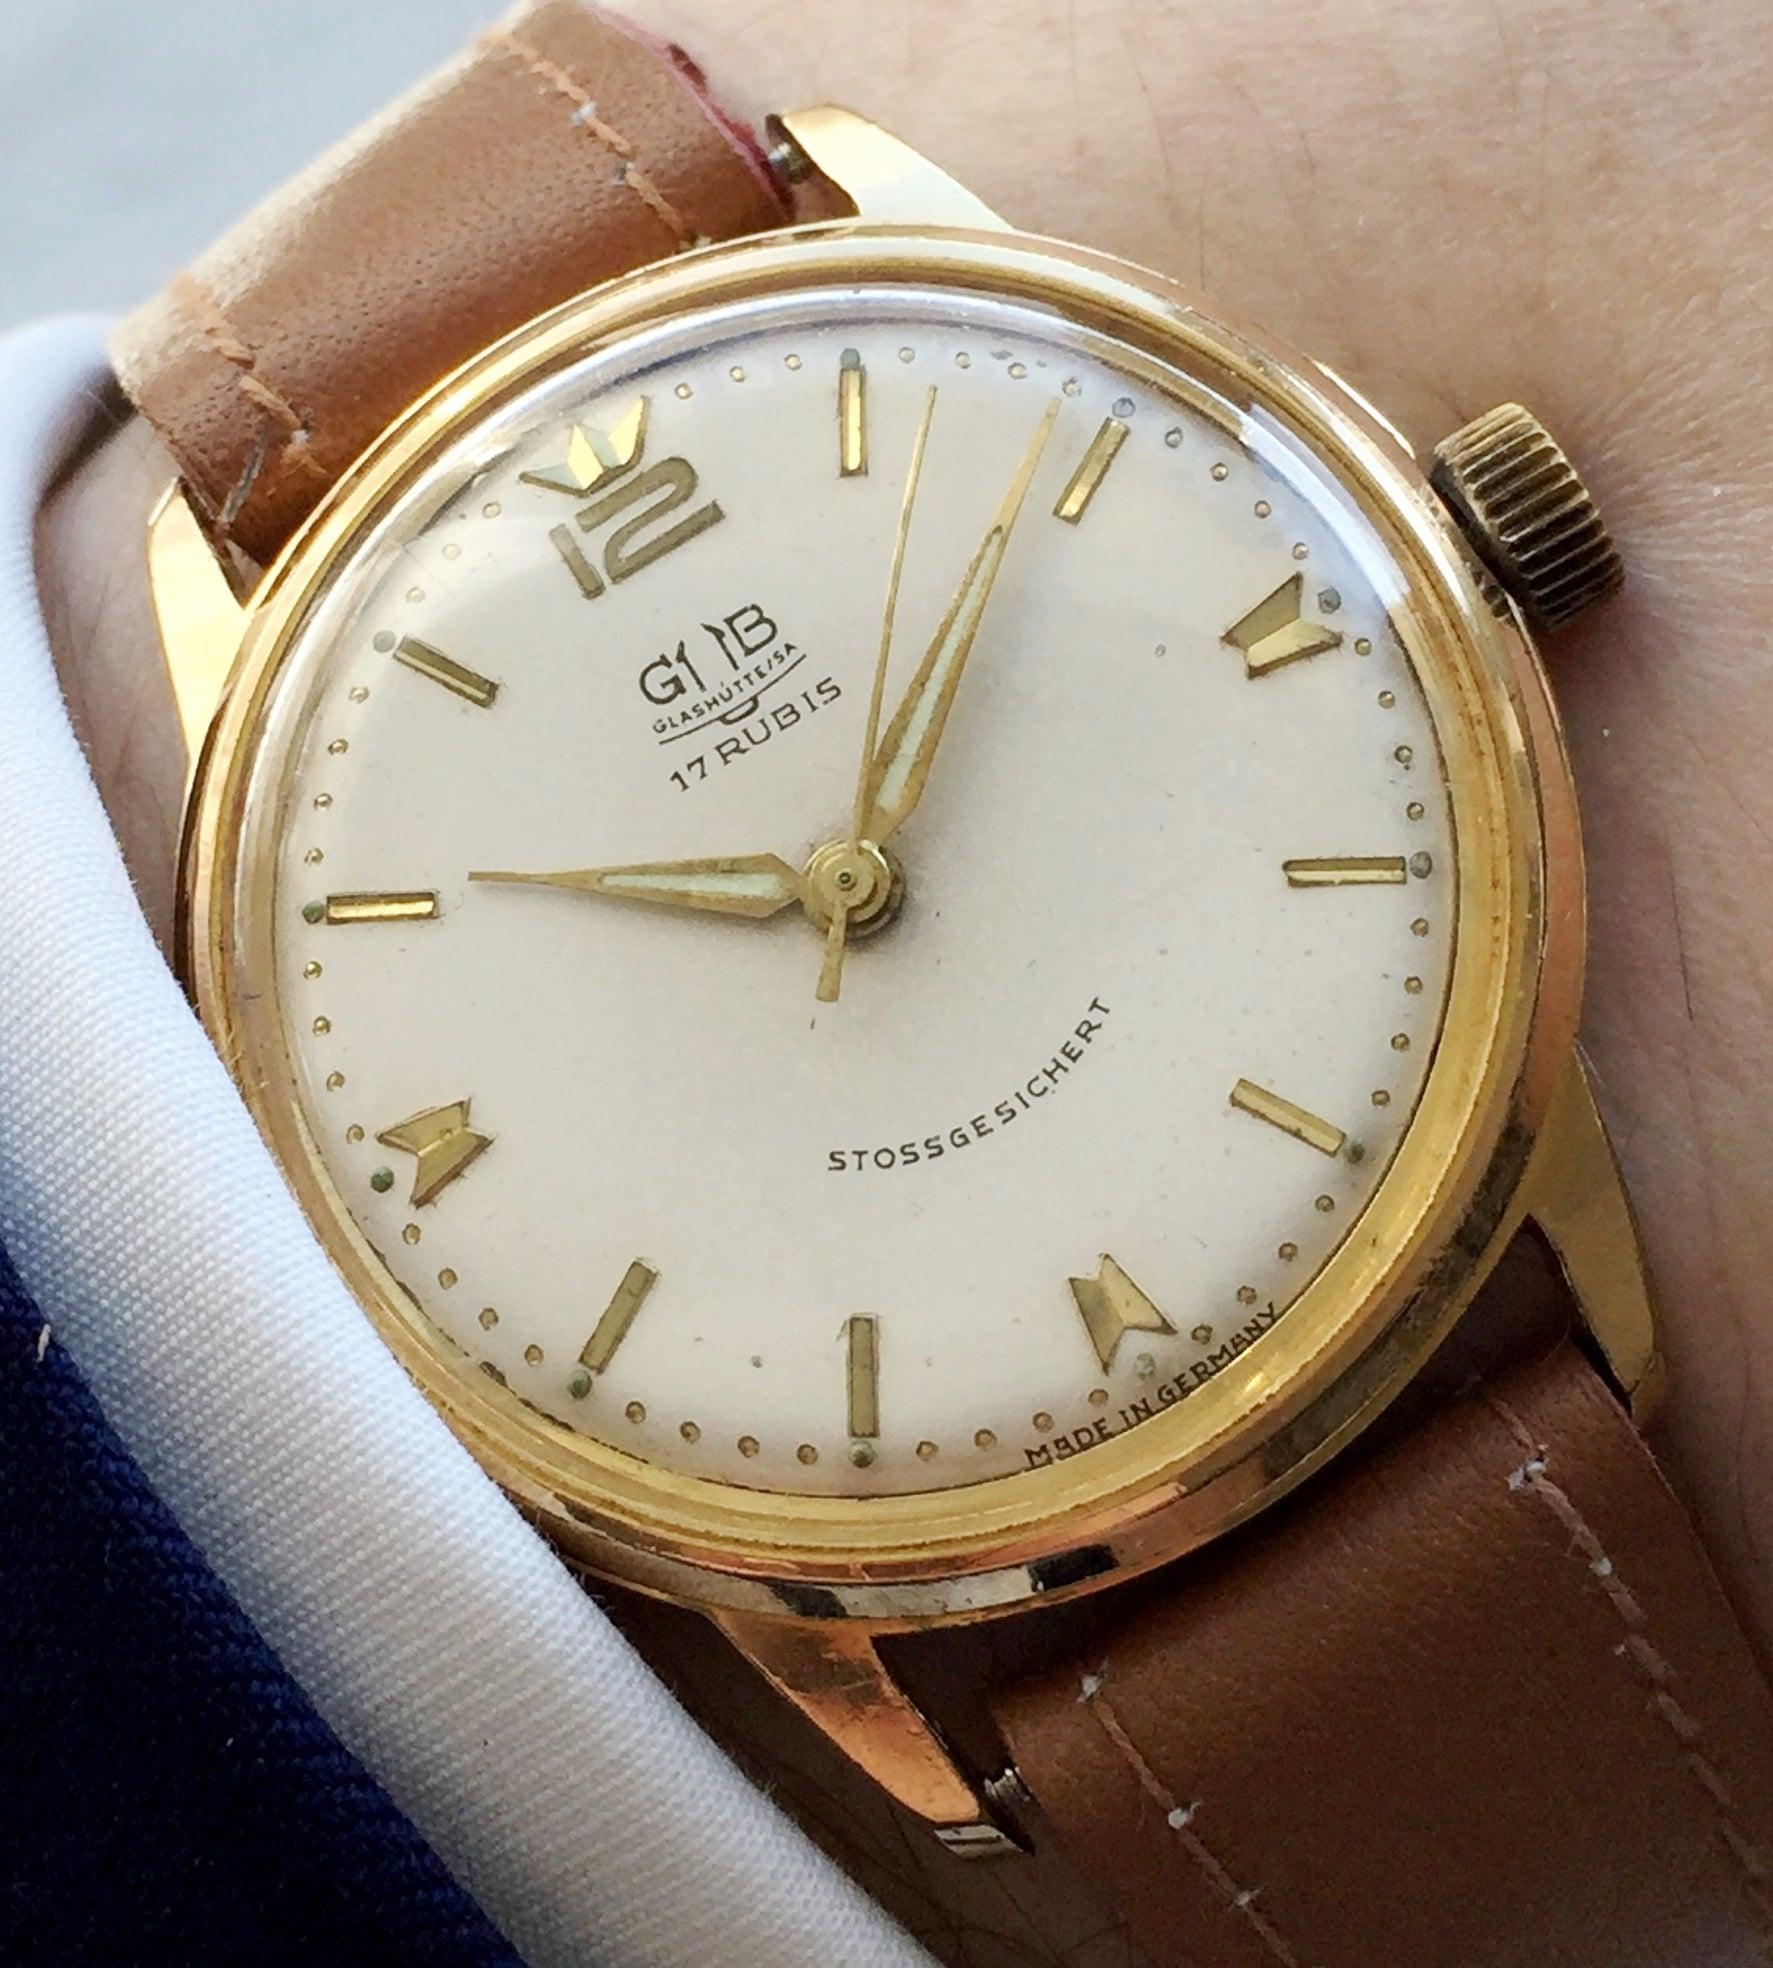 Vintage GUB Glashütte Handwinding Gold Plated Wristwatch